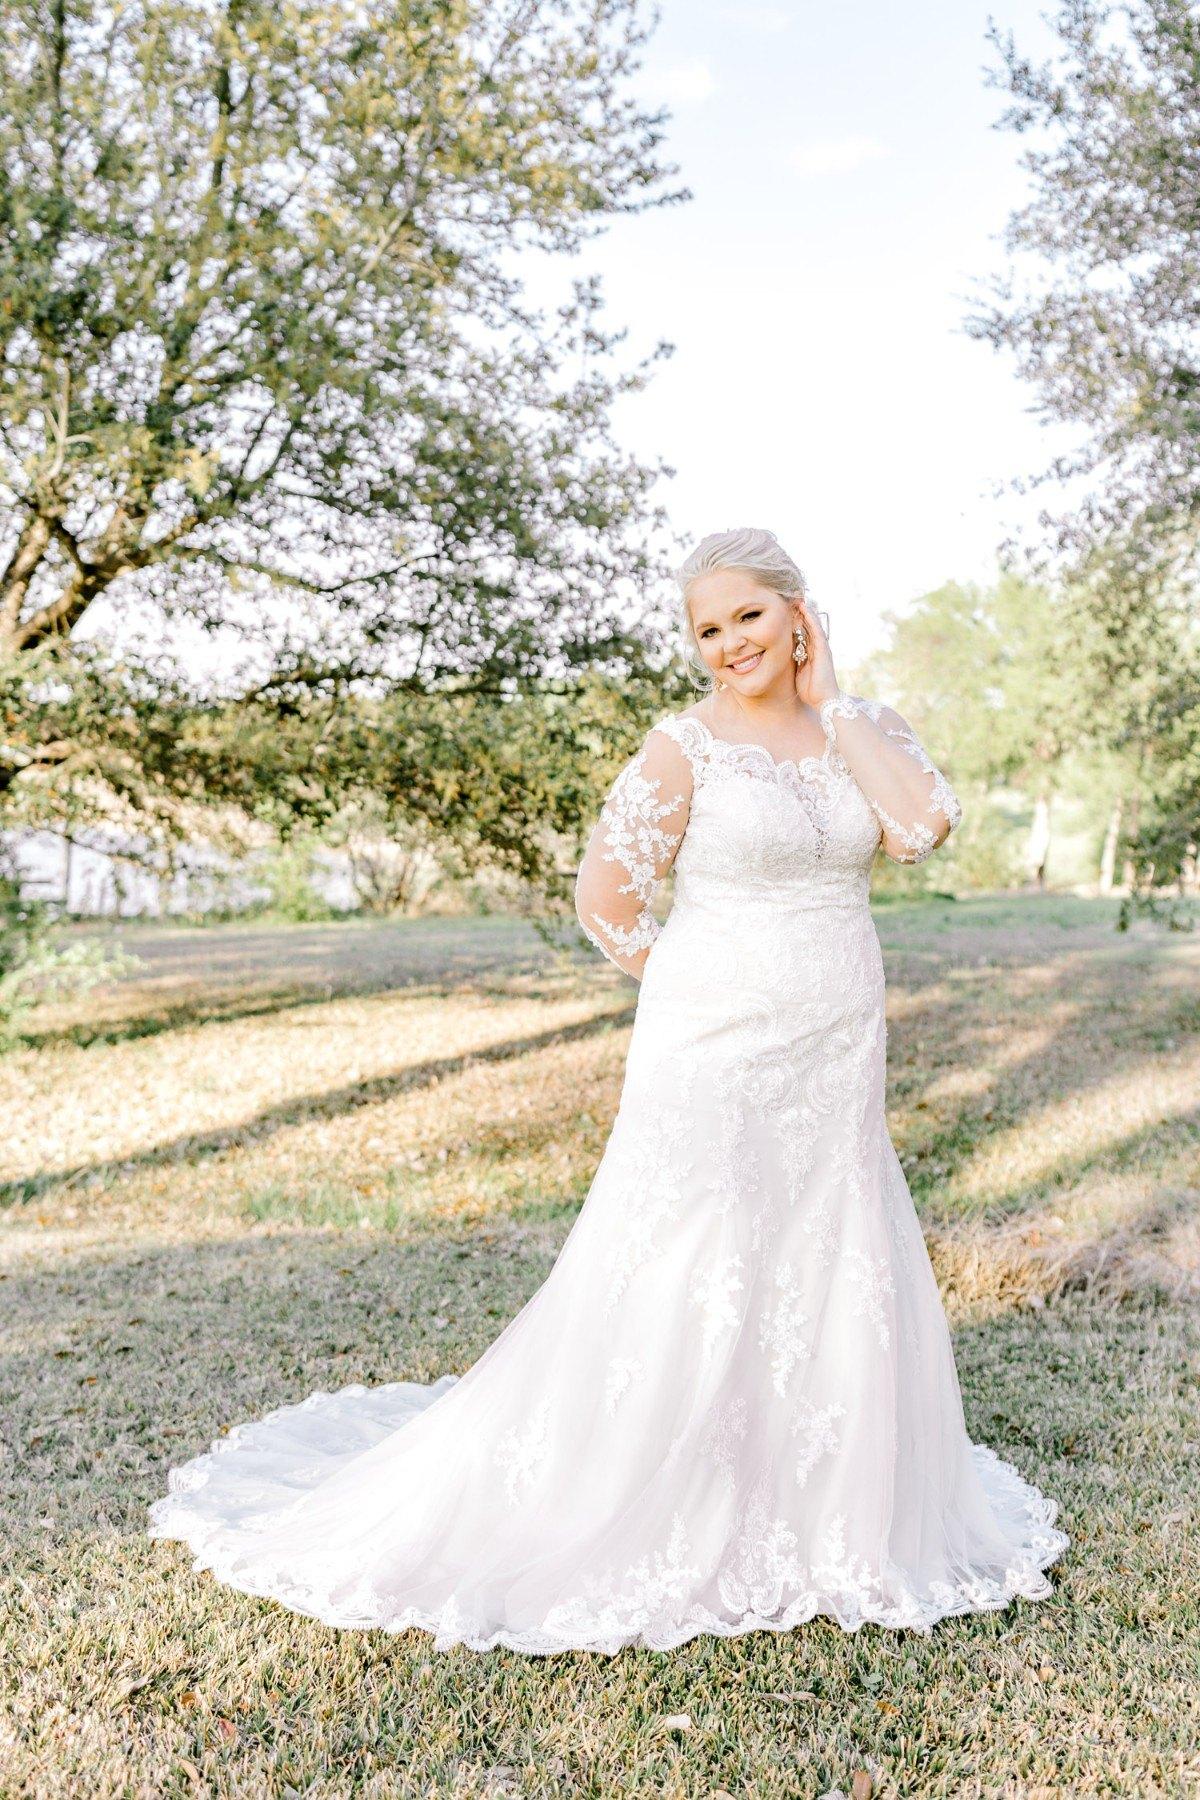 casidy-bridals-tradinghouse-lake-waco-wedding-photographer-kaitlyn-bullard-05.jpg